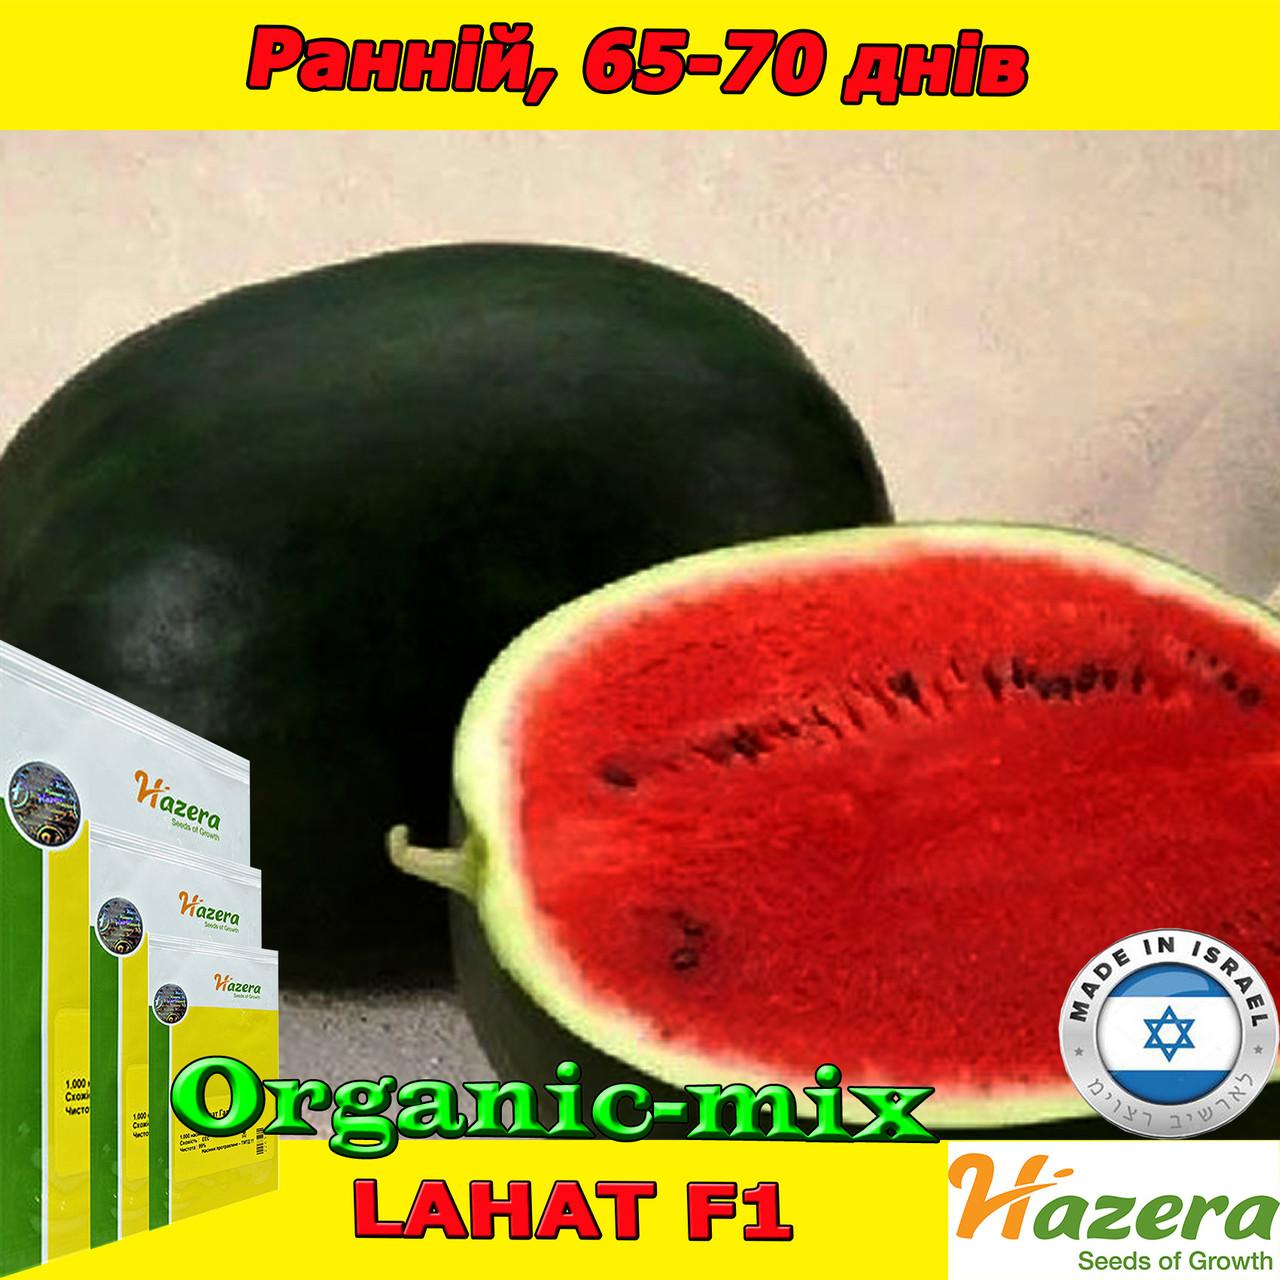 Семена, арбуз черный, ЛАХАТ F1 / LAHAT F1 ТМ Hazera (Израиль), 500 семян